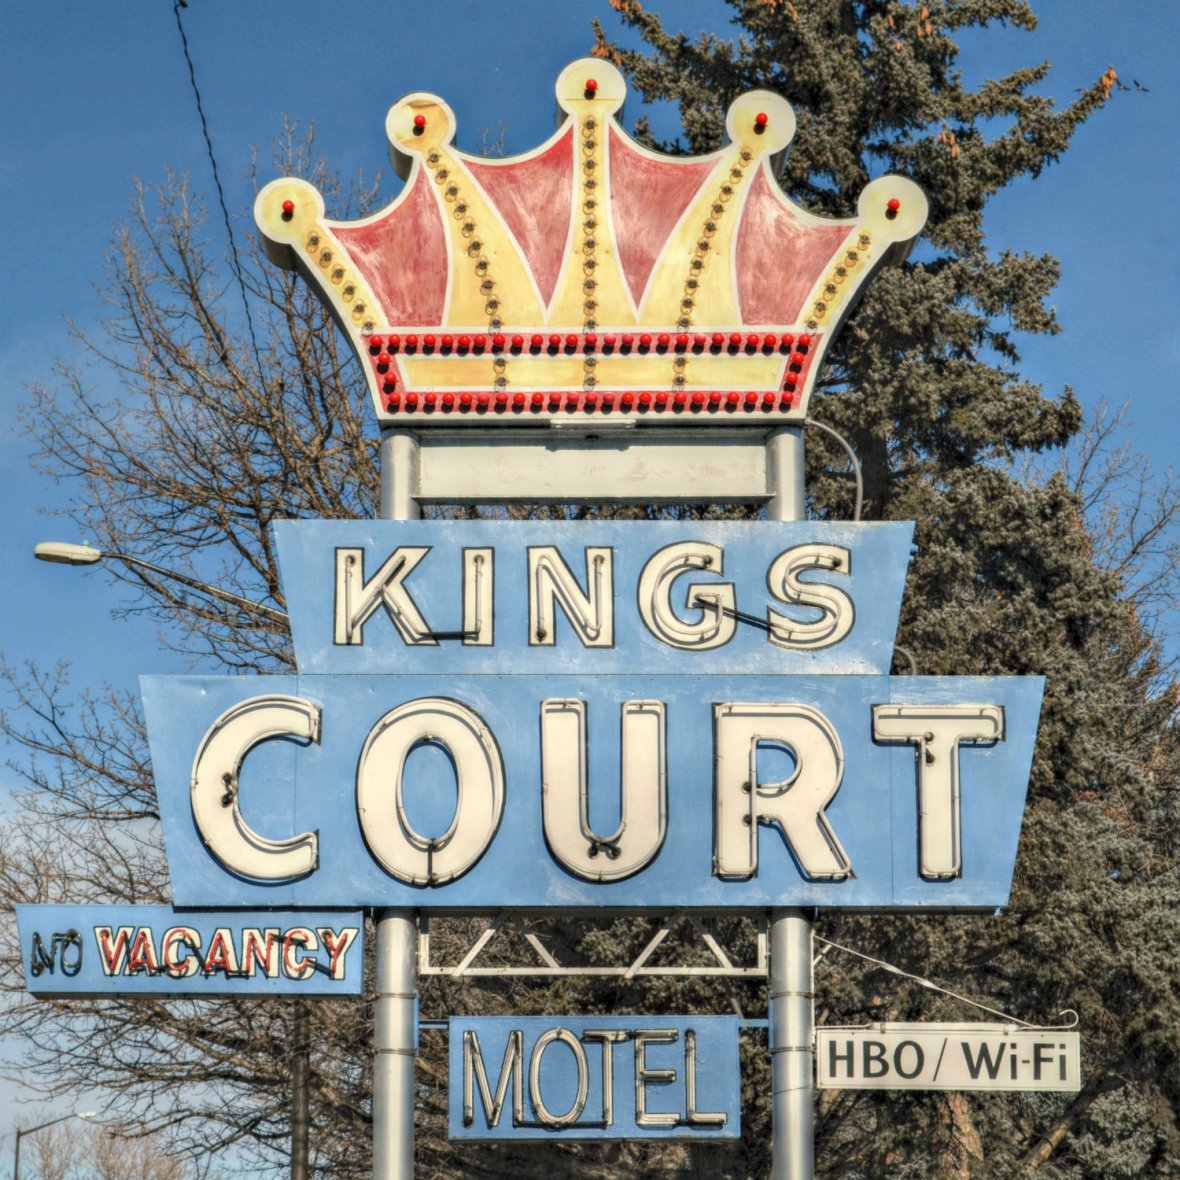 Kings Court - 928 North Lincoln Avenue, Loveland, Colorado U.S.A. - December 24, 2013